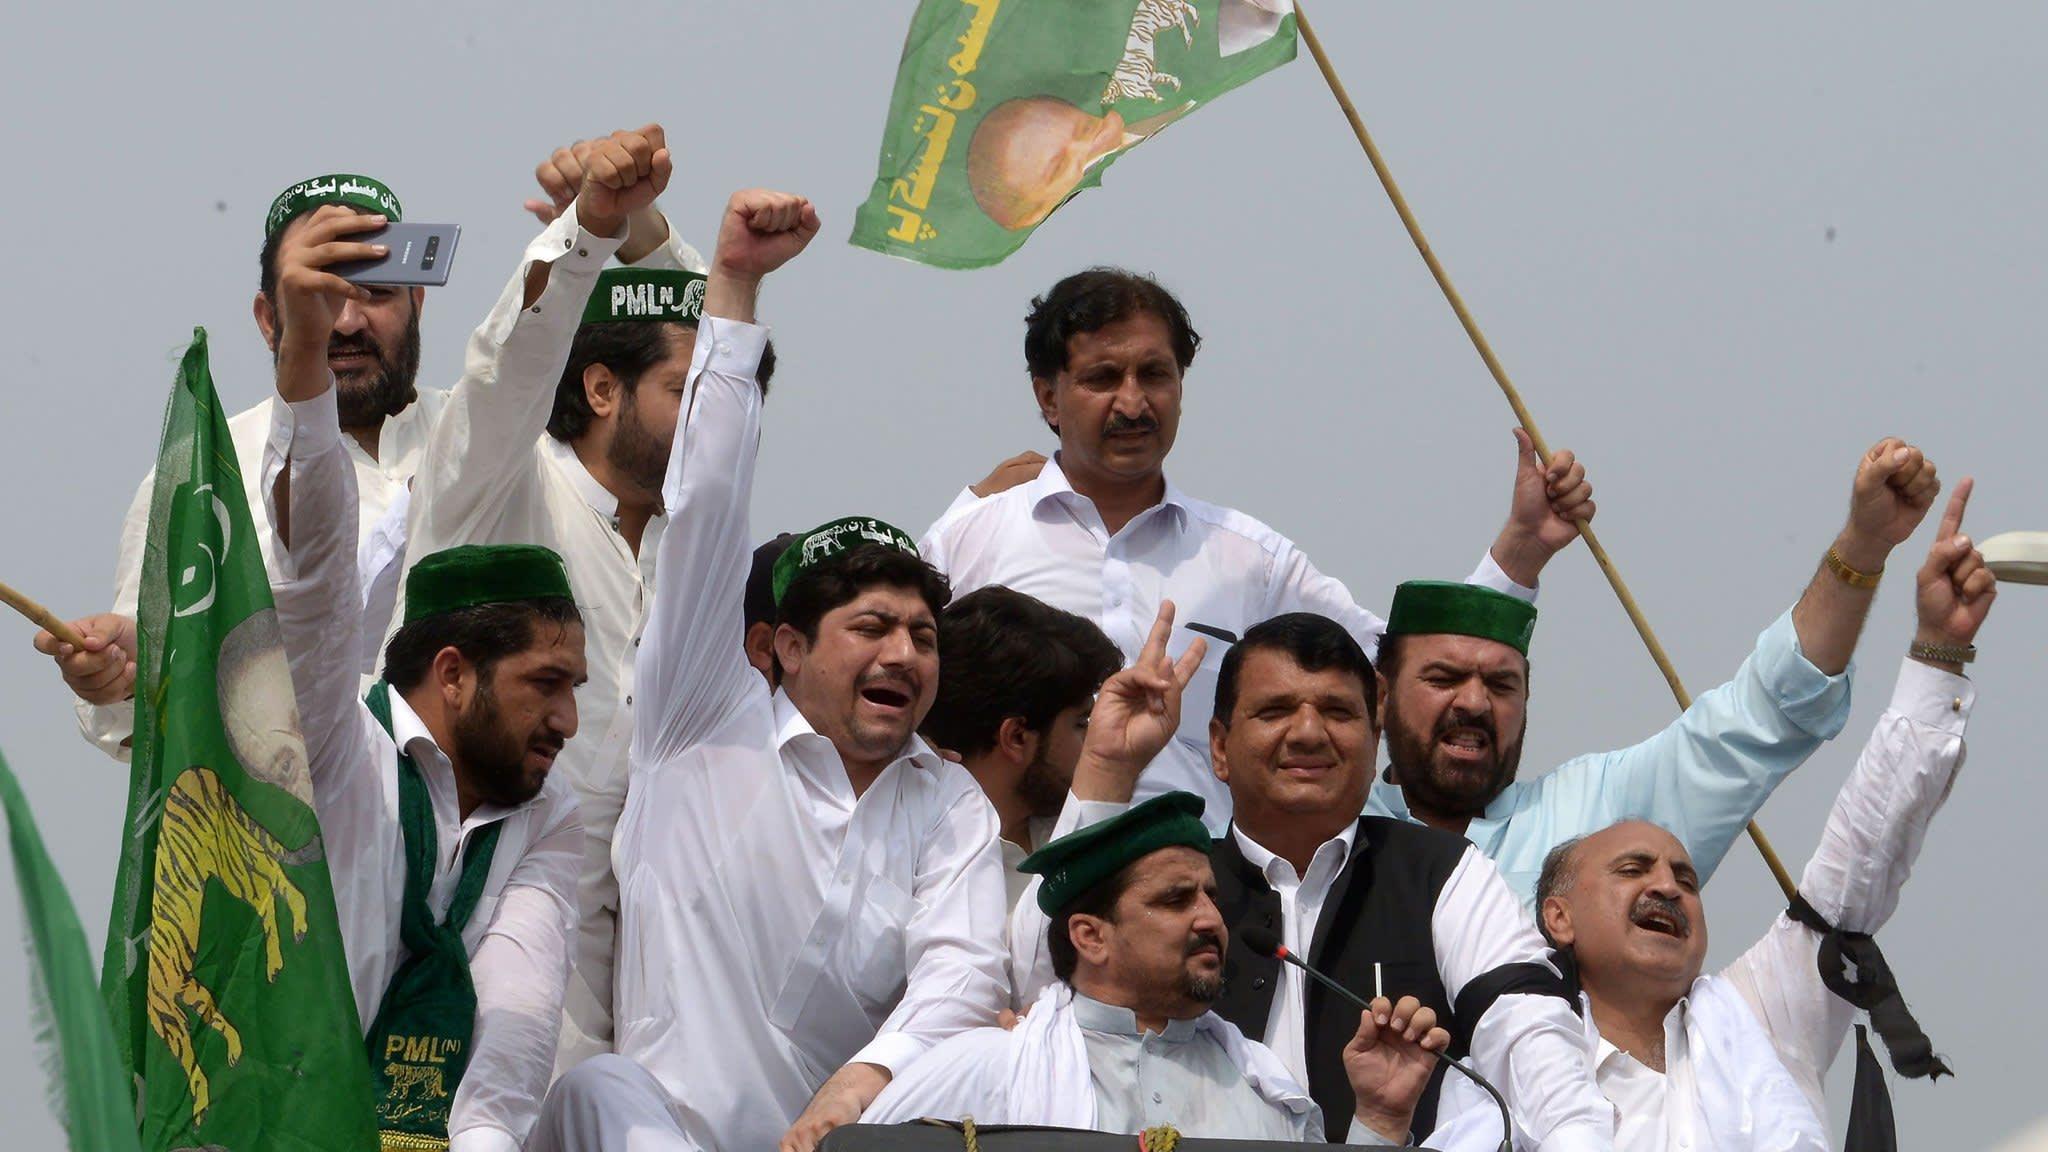 Nawaz Sharif en route to Pakistan to face jail for corruption